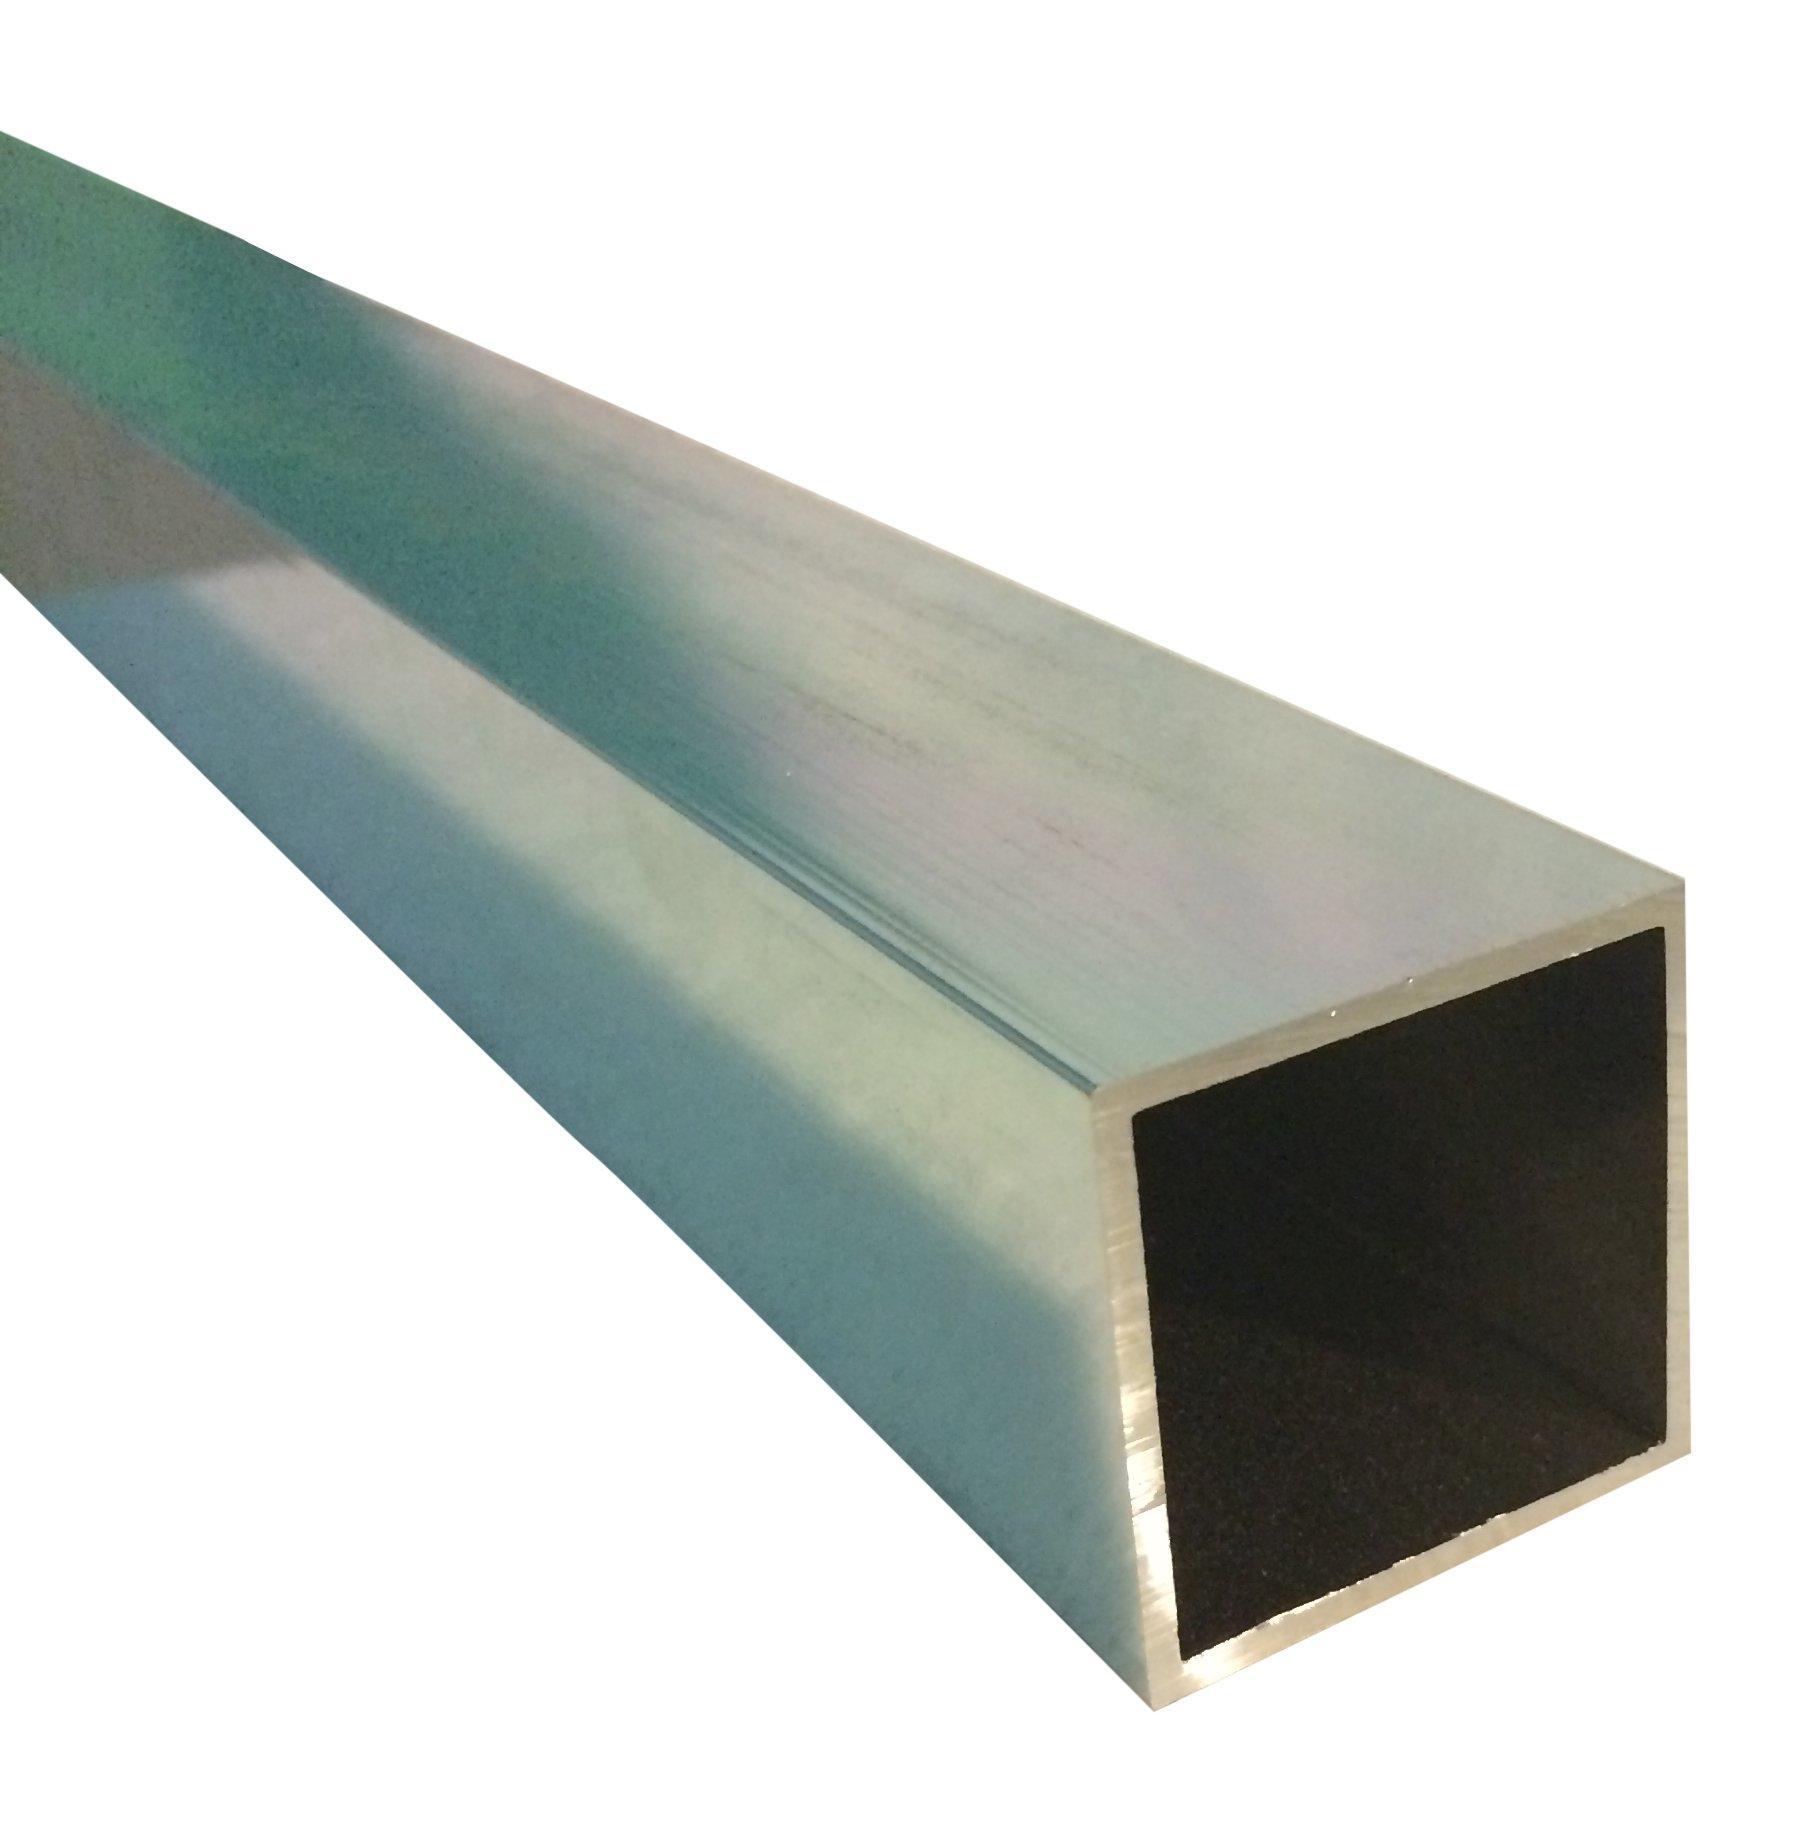 Sanymetal 13312 1 3/4'' Square Post x 70'' Aluminum Long Brite